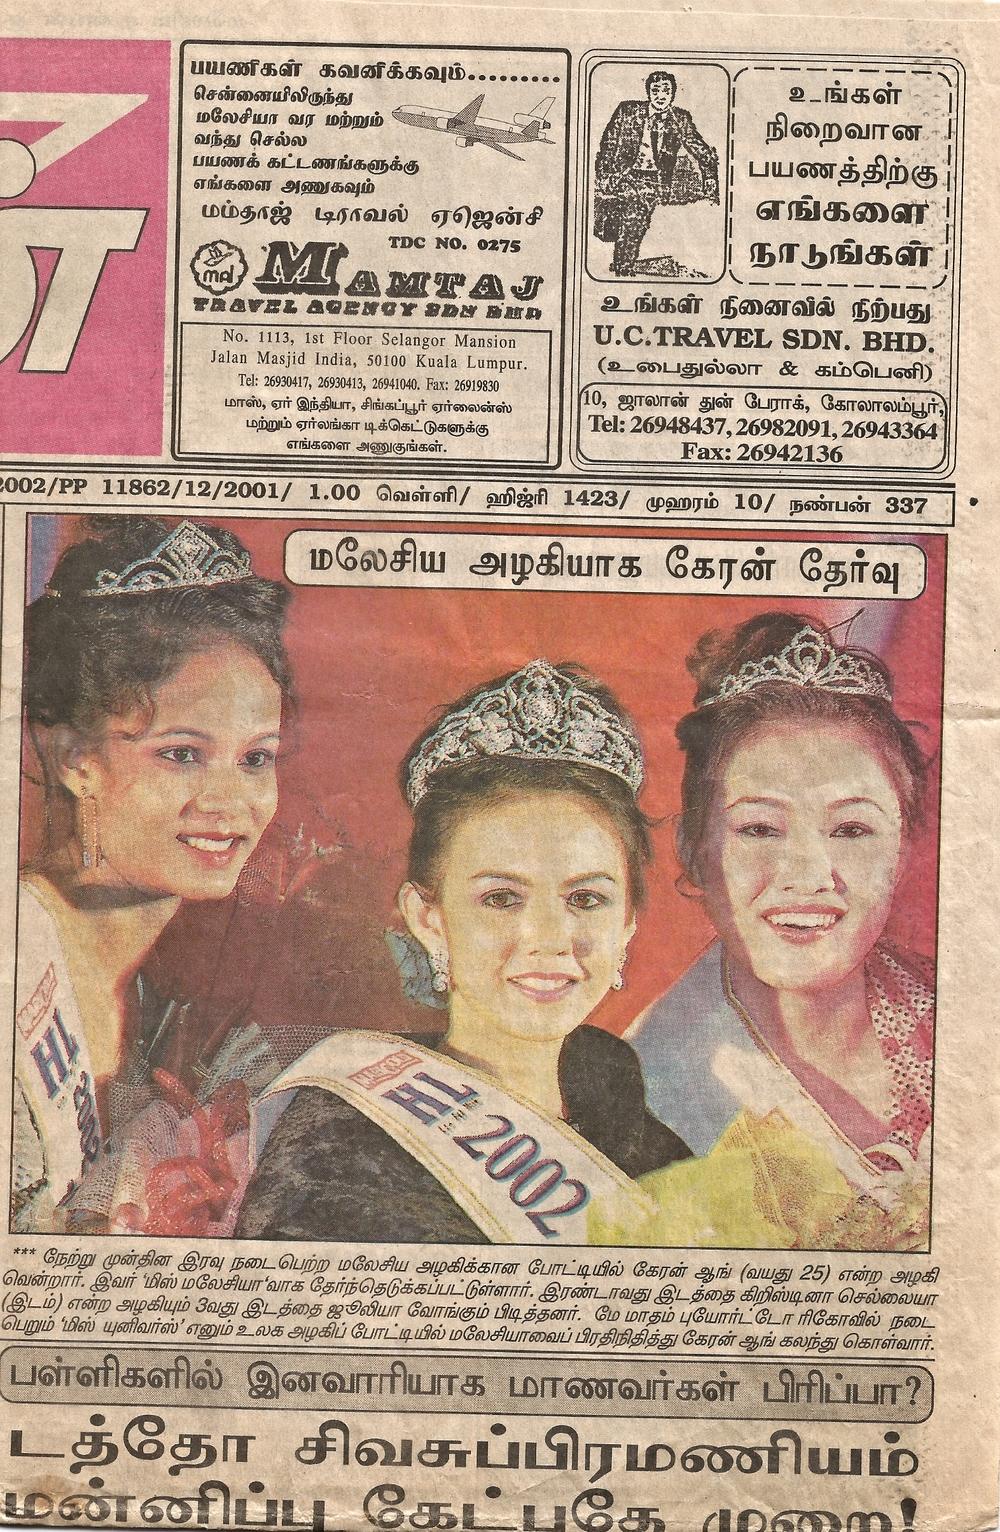 Tamil Nanban 24-3-2002.jpeg